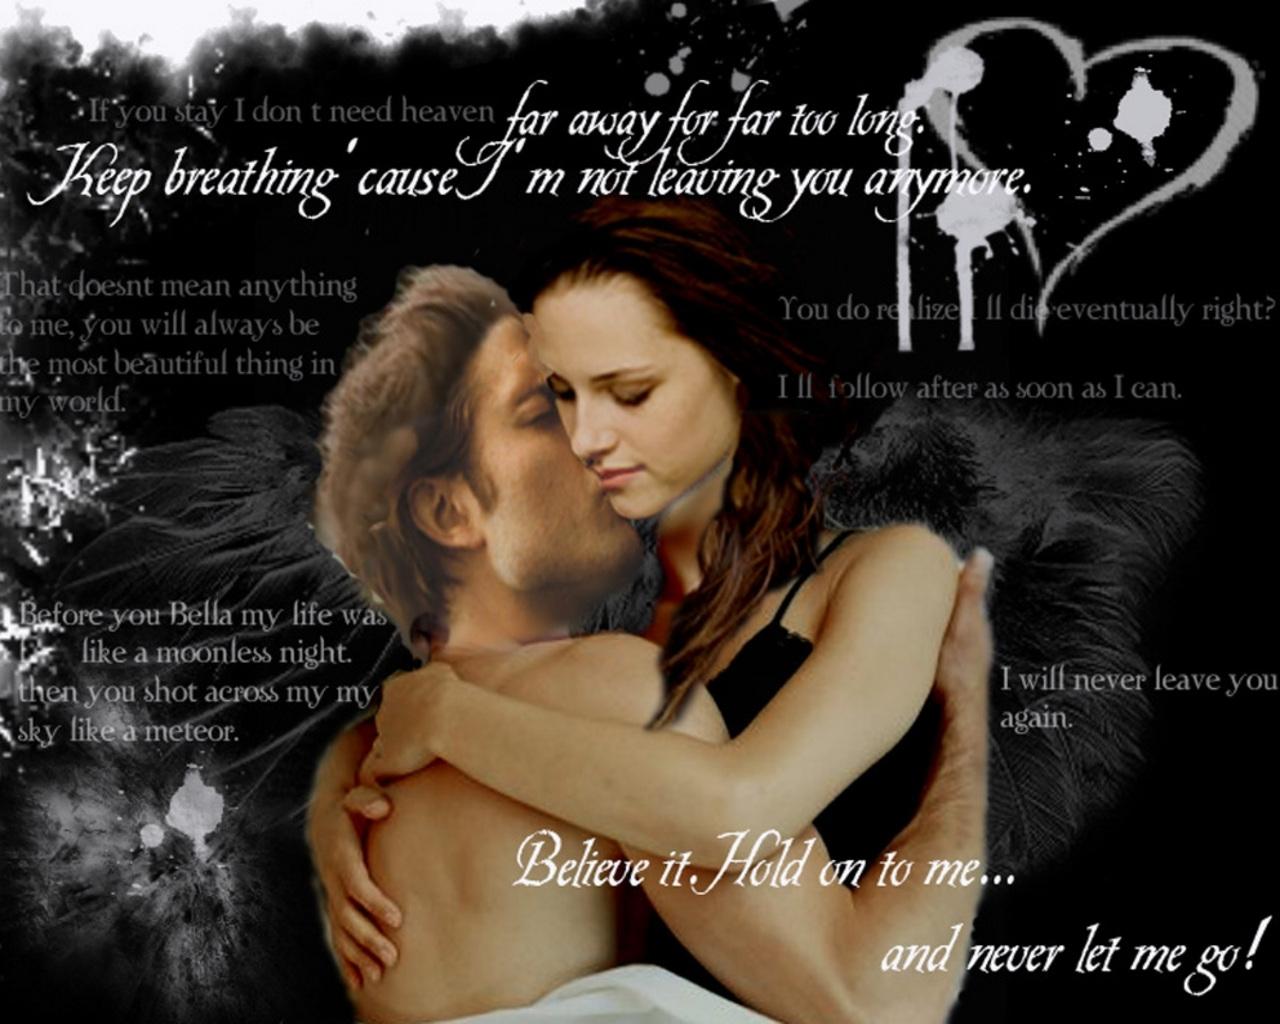 Edward & Bella reunited